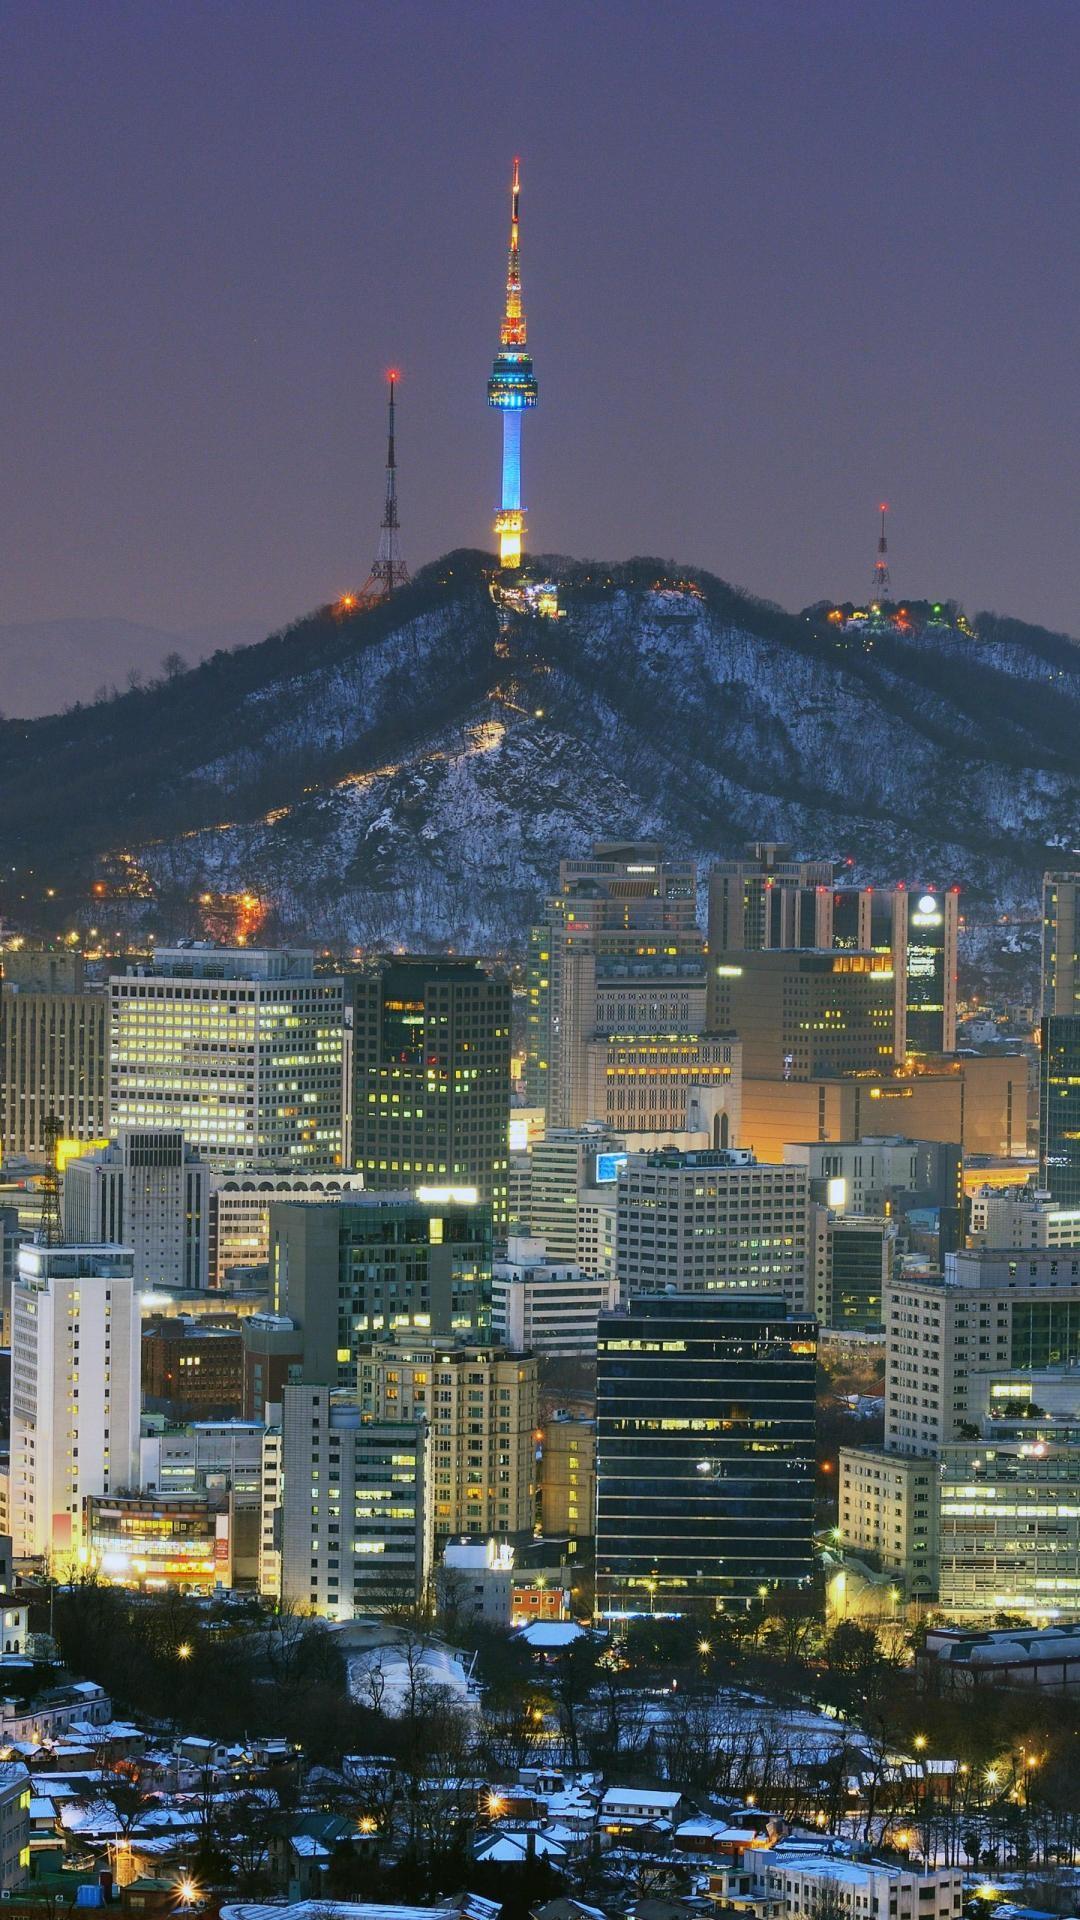 Seoul hd wallpaper for iPhone 6 plus